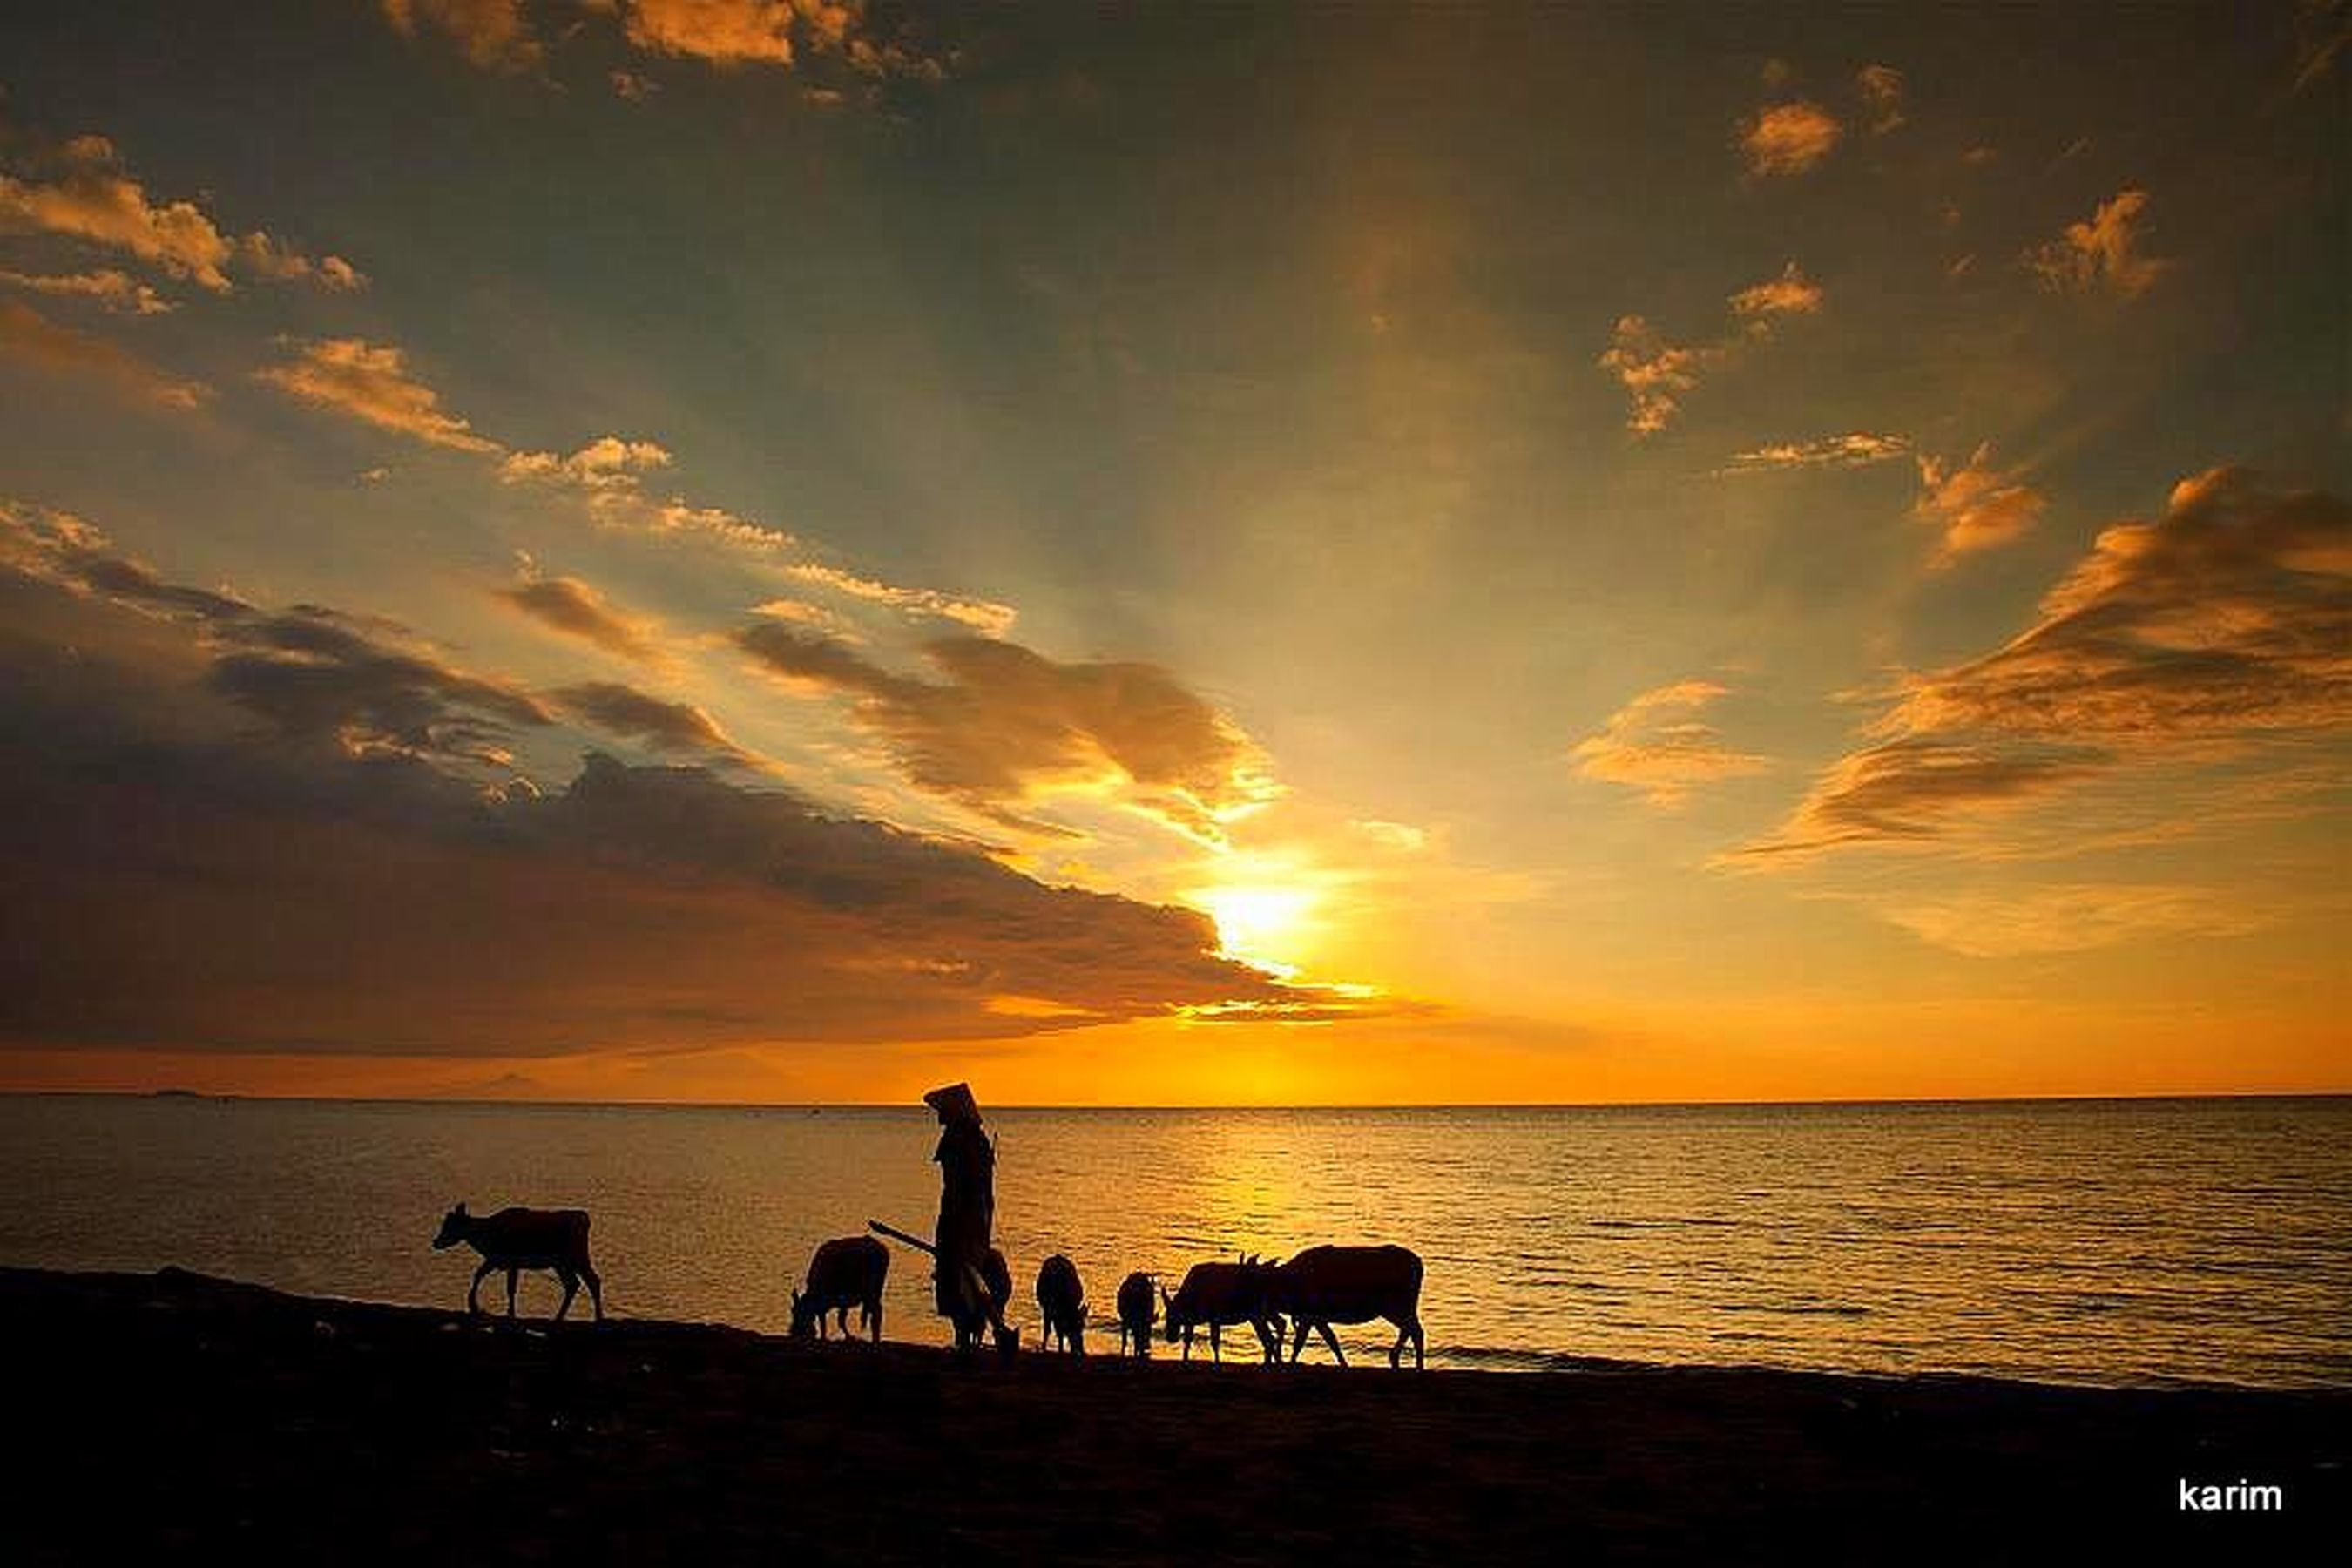 Sunset Silhouette EyeEm Best Shots EyeEM Beach Photography